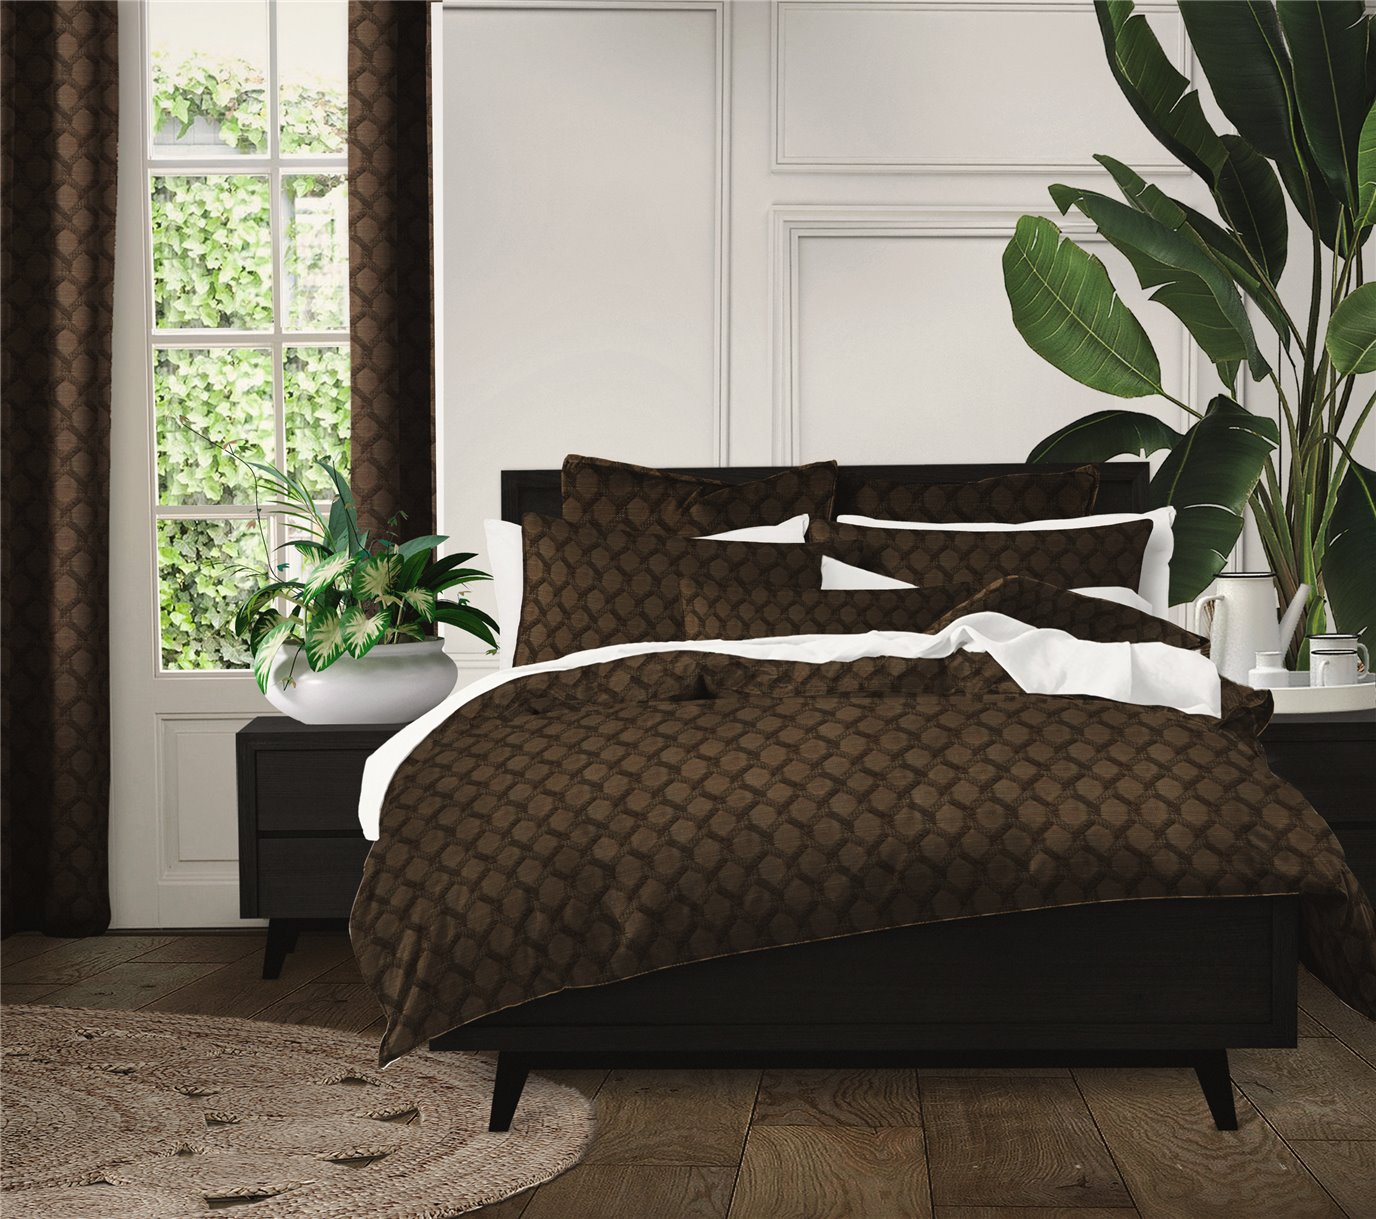 Malden Chocolate Comforter Set - Super King